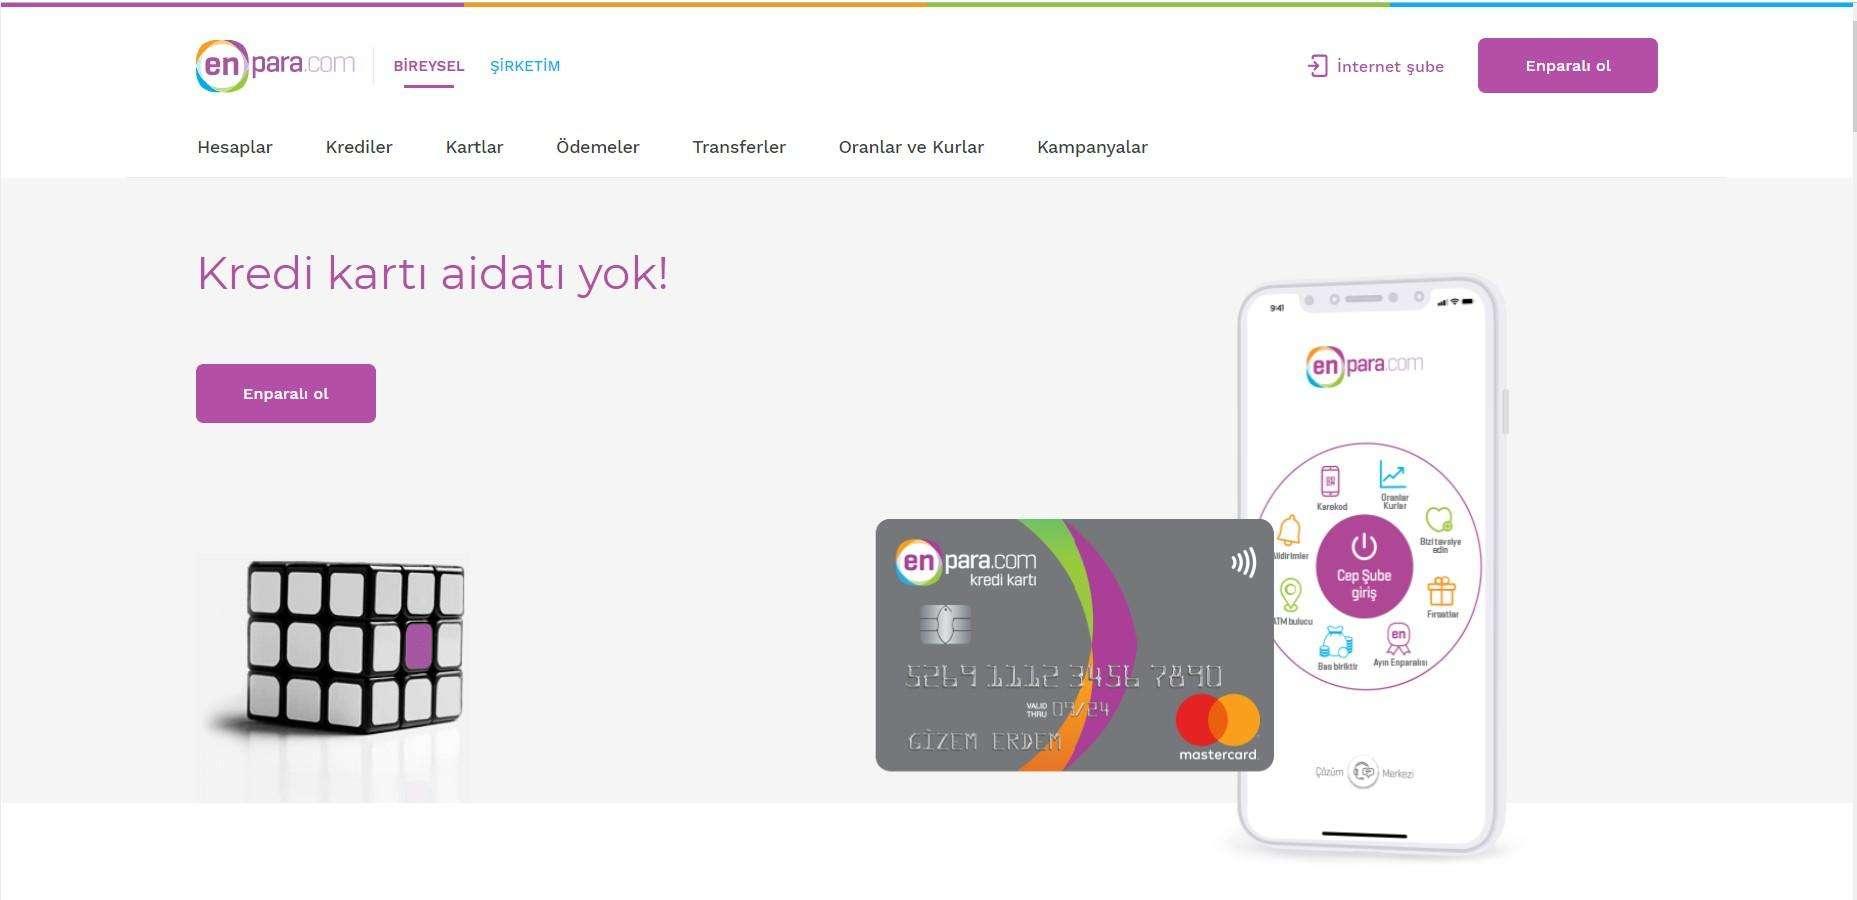 qnb finansbank internetten hesap açma